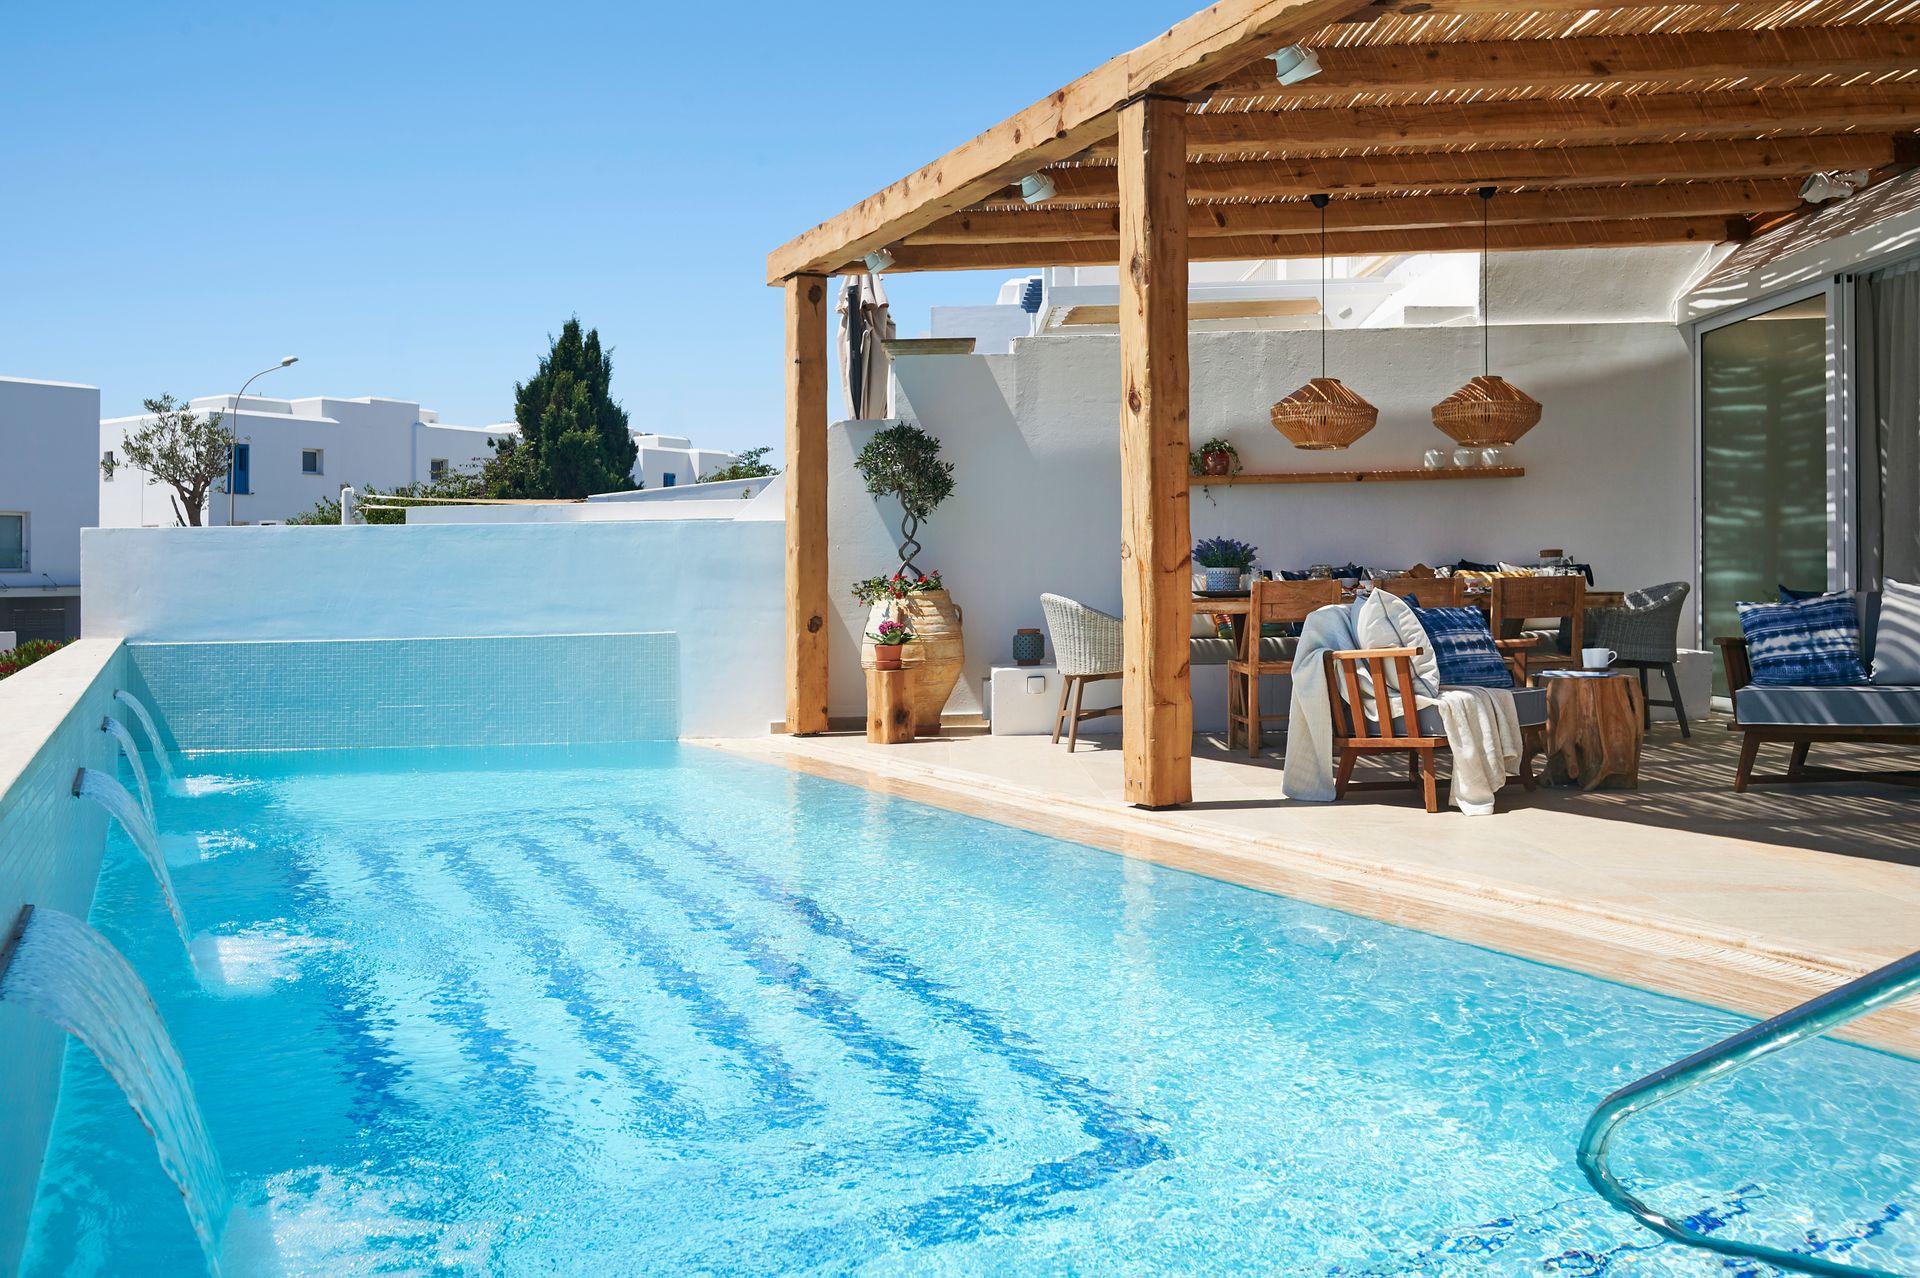 Louis Nausicaa Luxury Villas - Κύπρος ✦ 8 Ημέρες (7